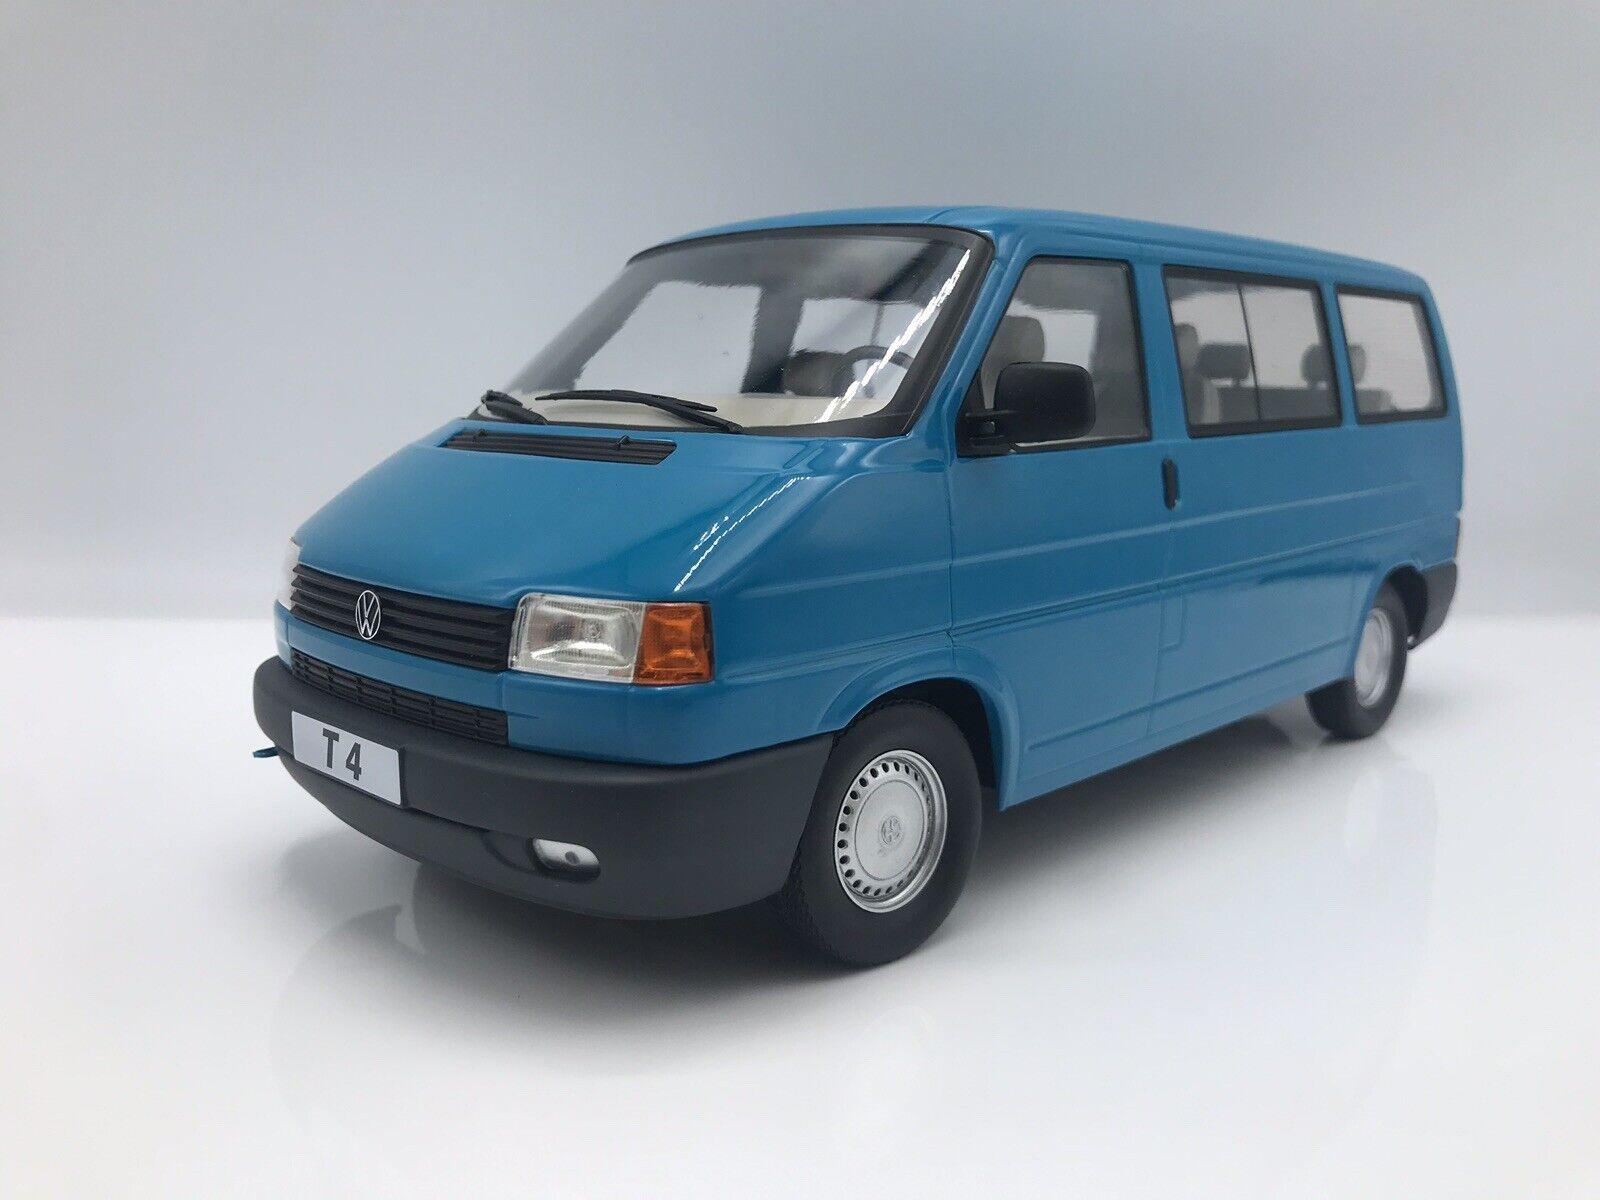 venta de ofertas VW t4 Cocheavelle 1992 azul autobús matrícula - 1 1 1 18 KK-scale new    envío gratis